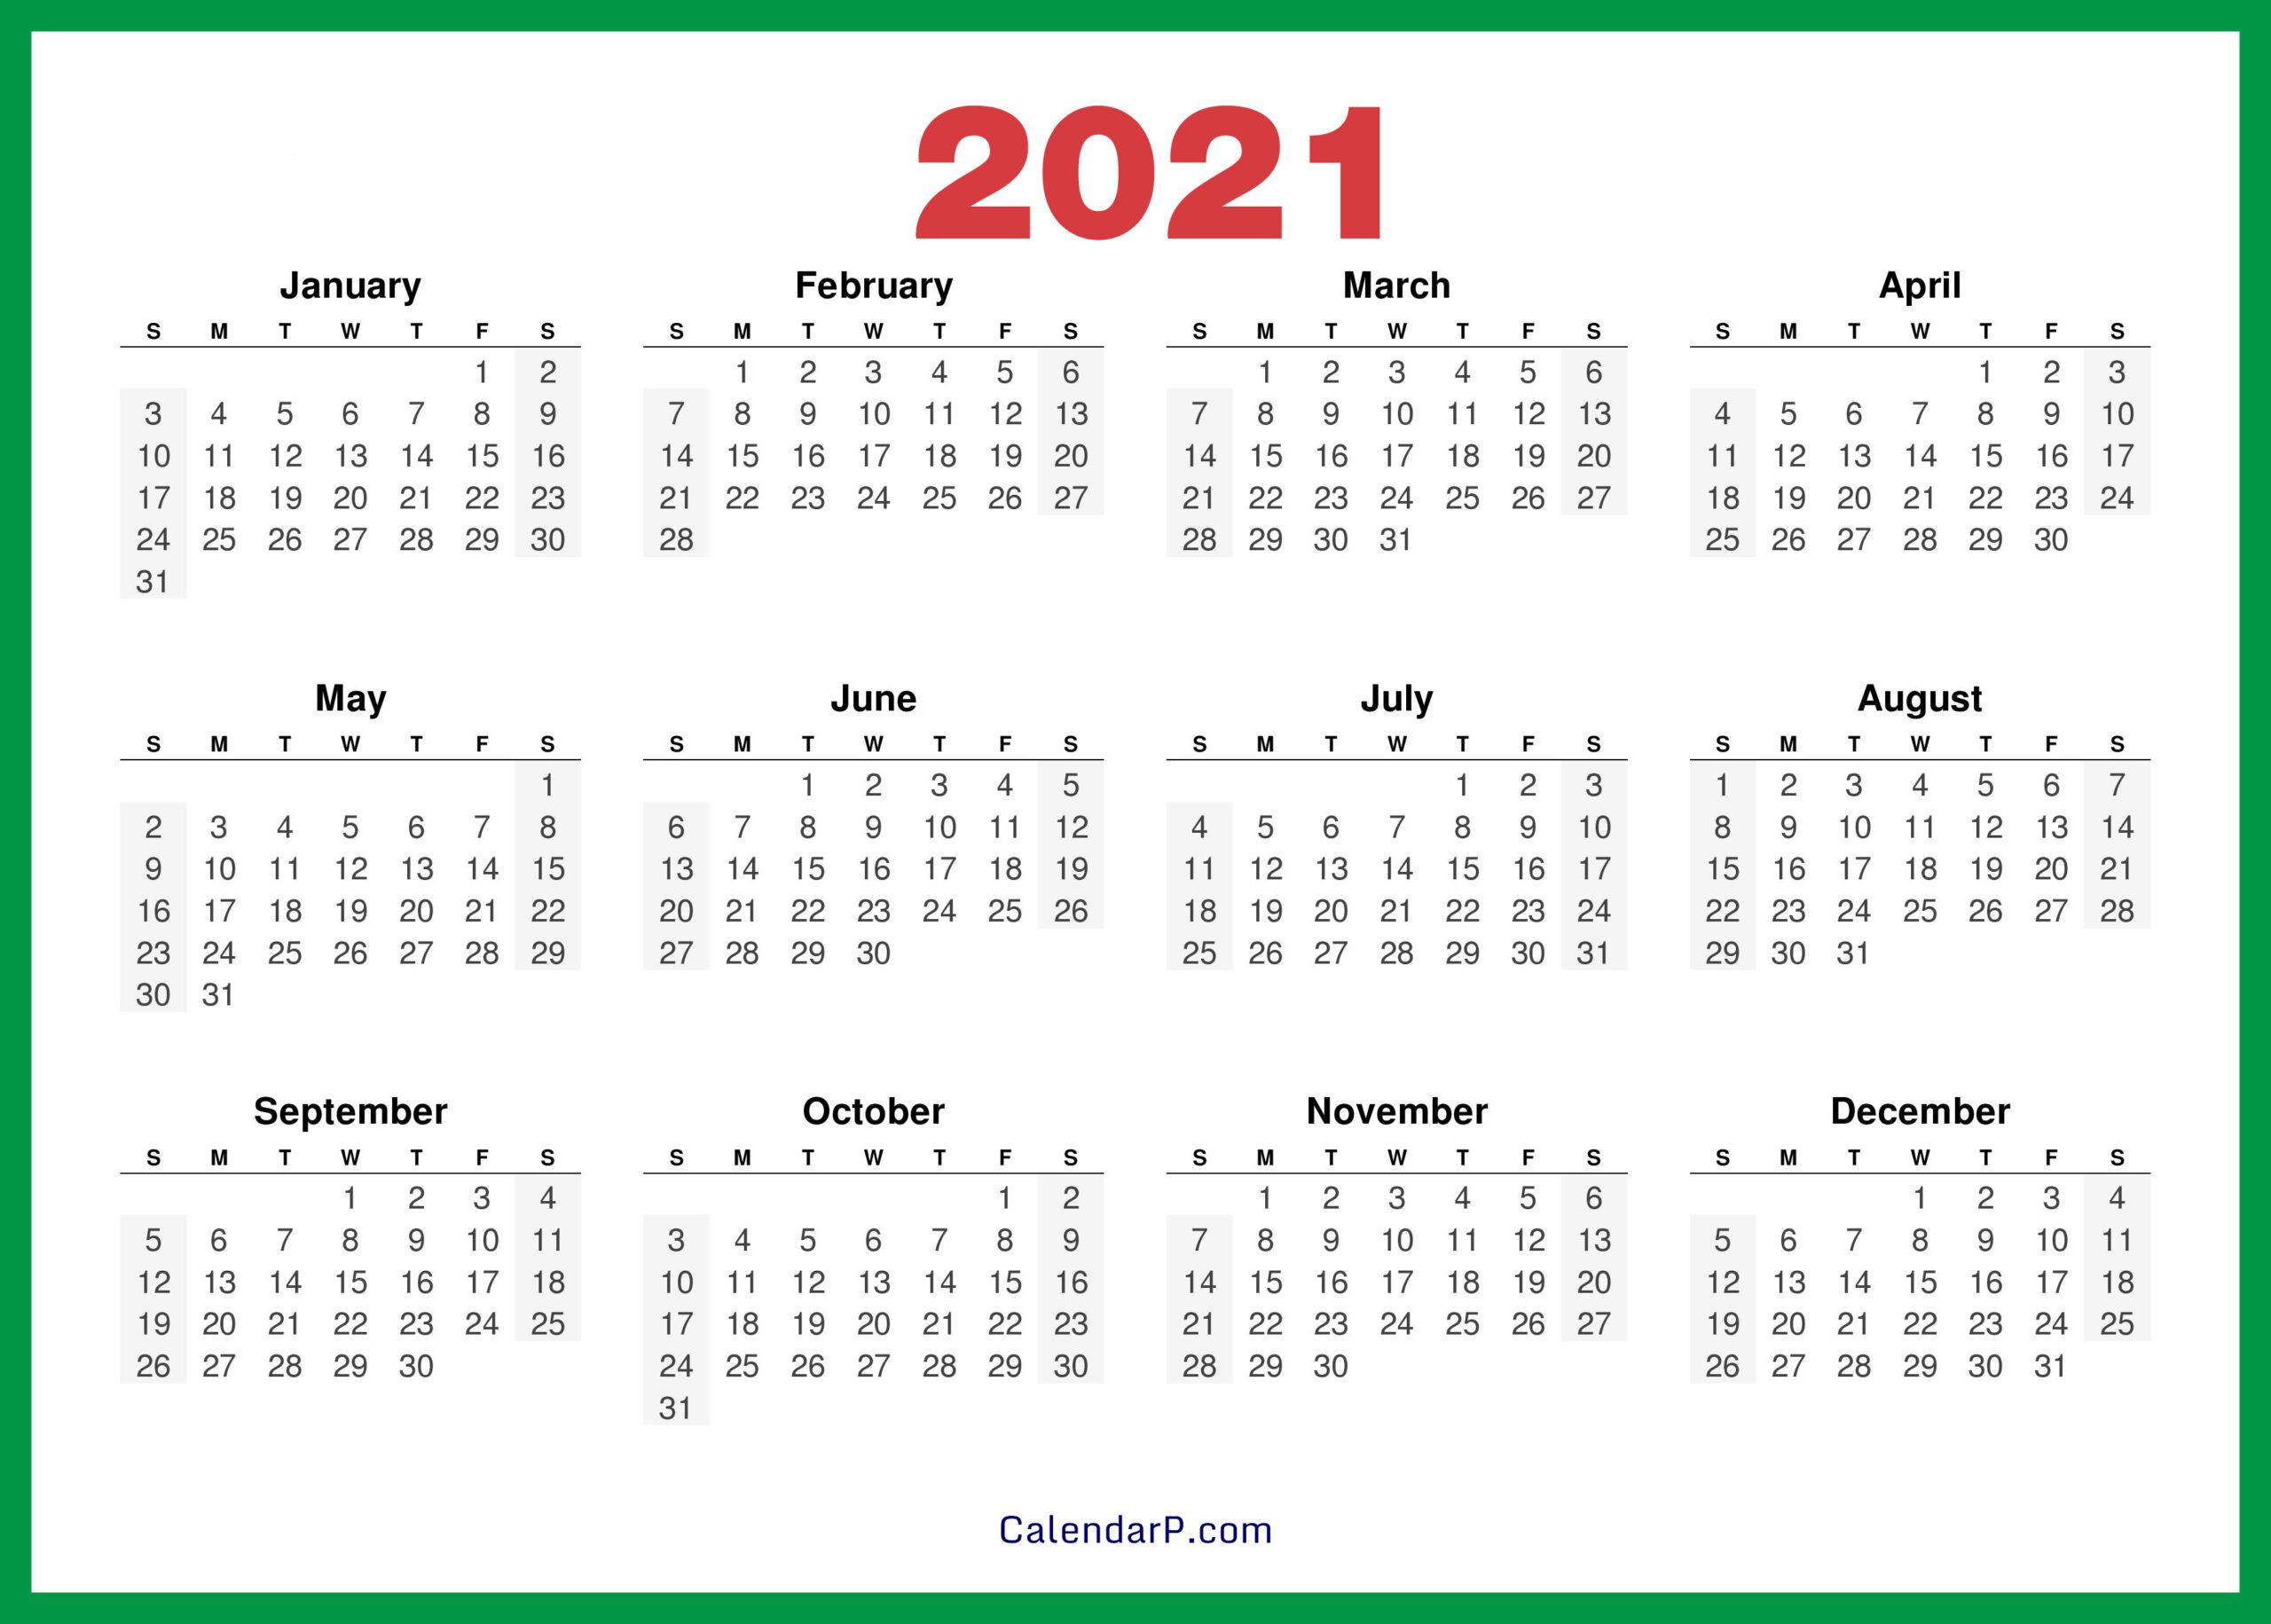 2021 Calendar Printable Free, Hd - Green - Calendarp